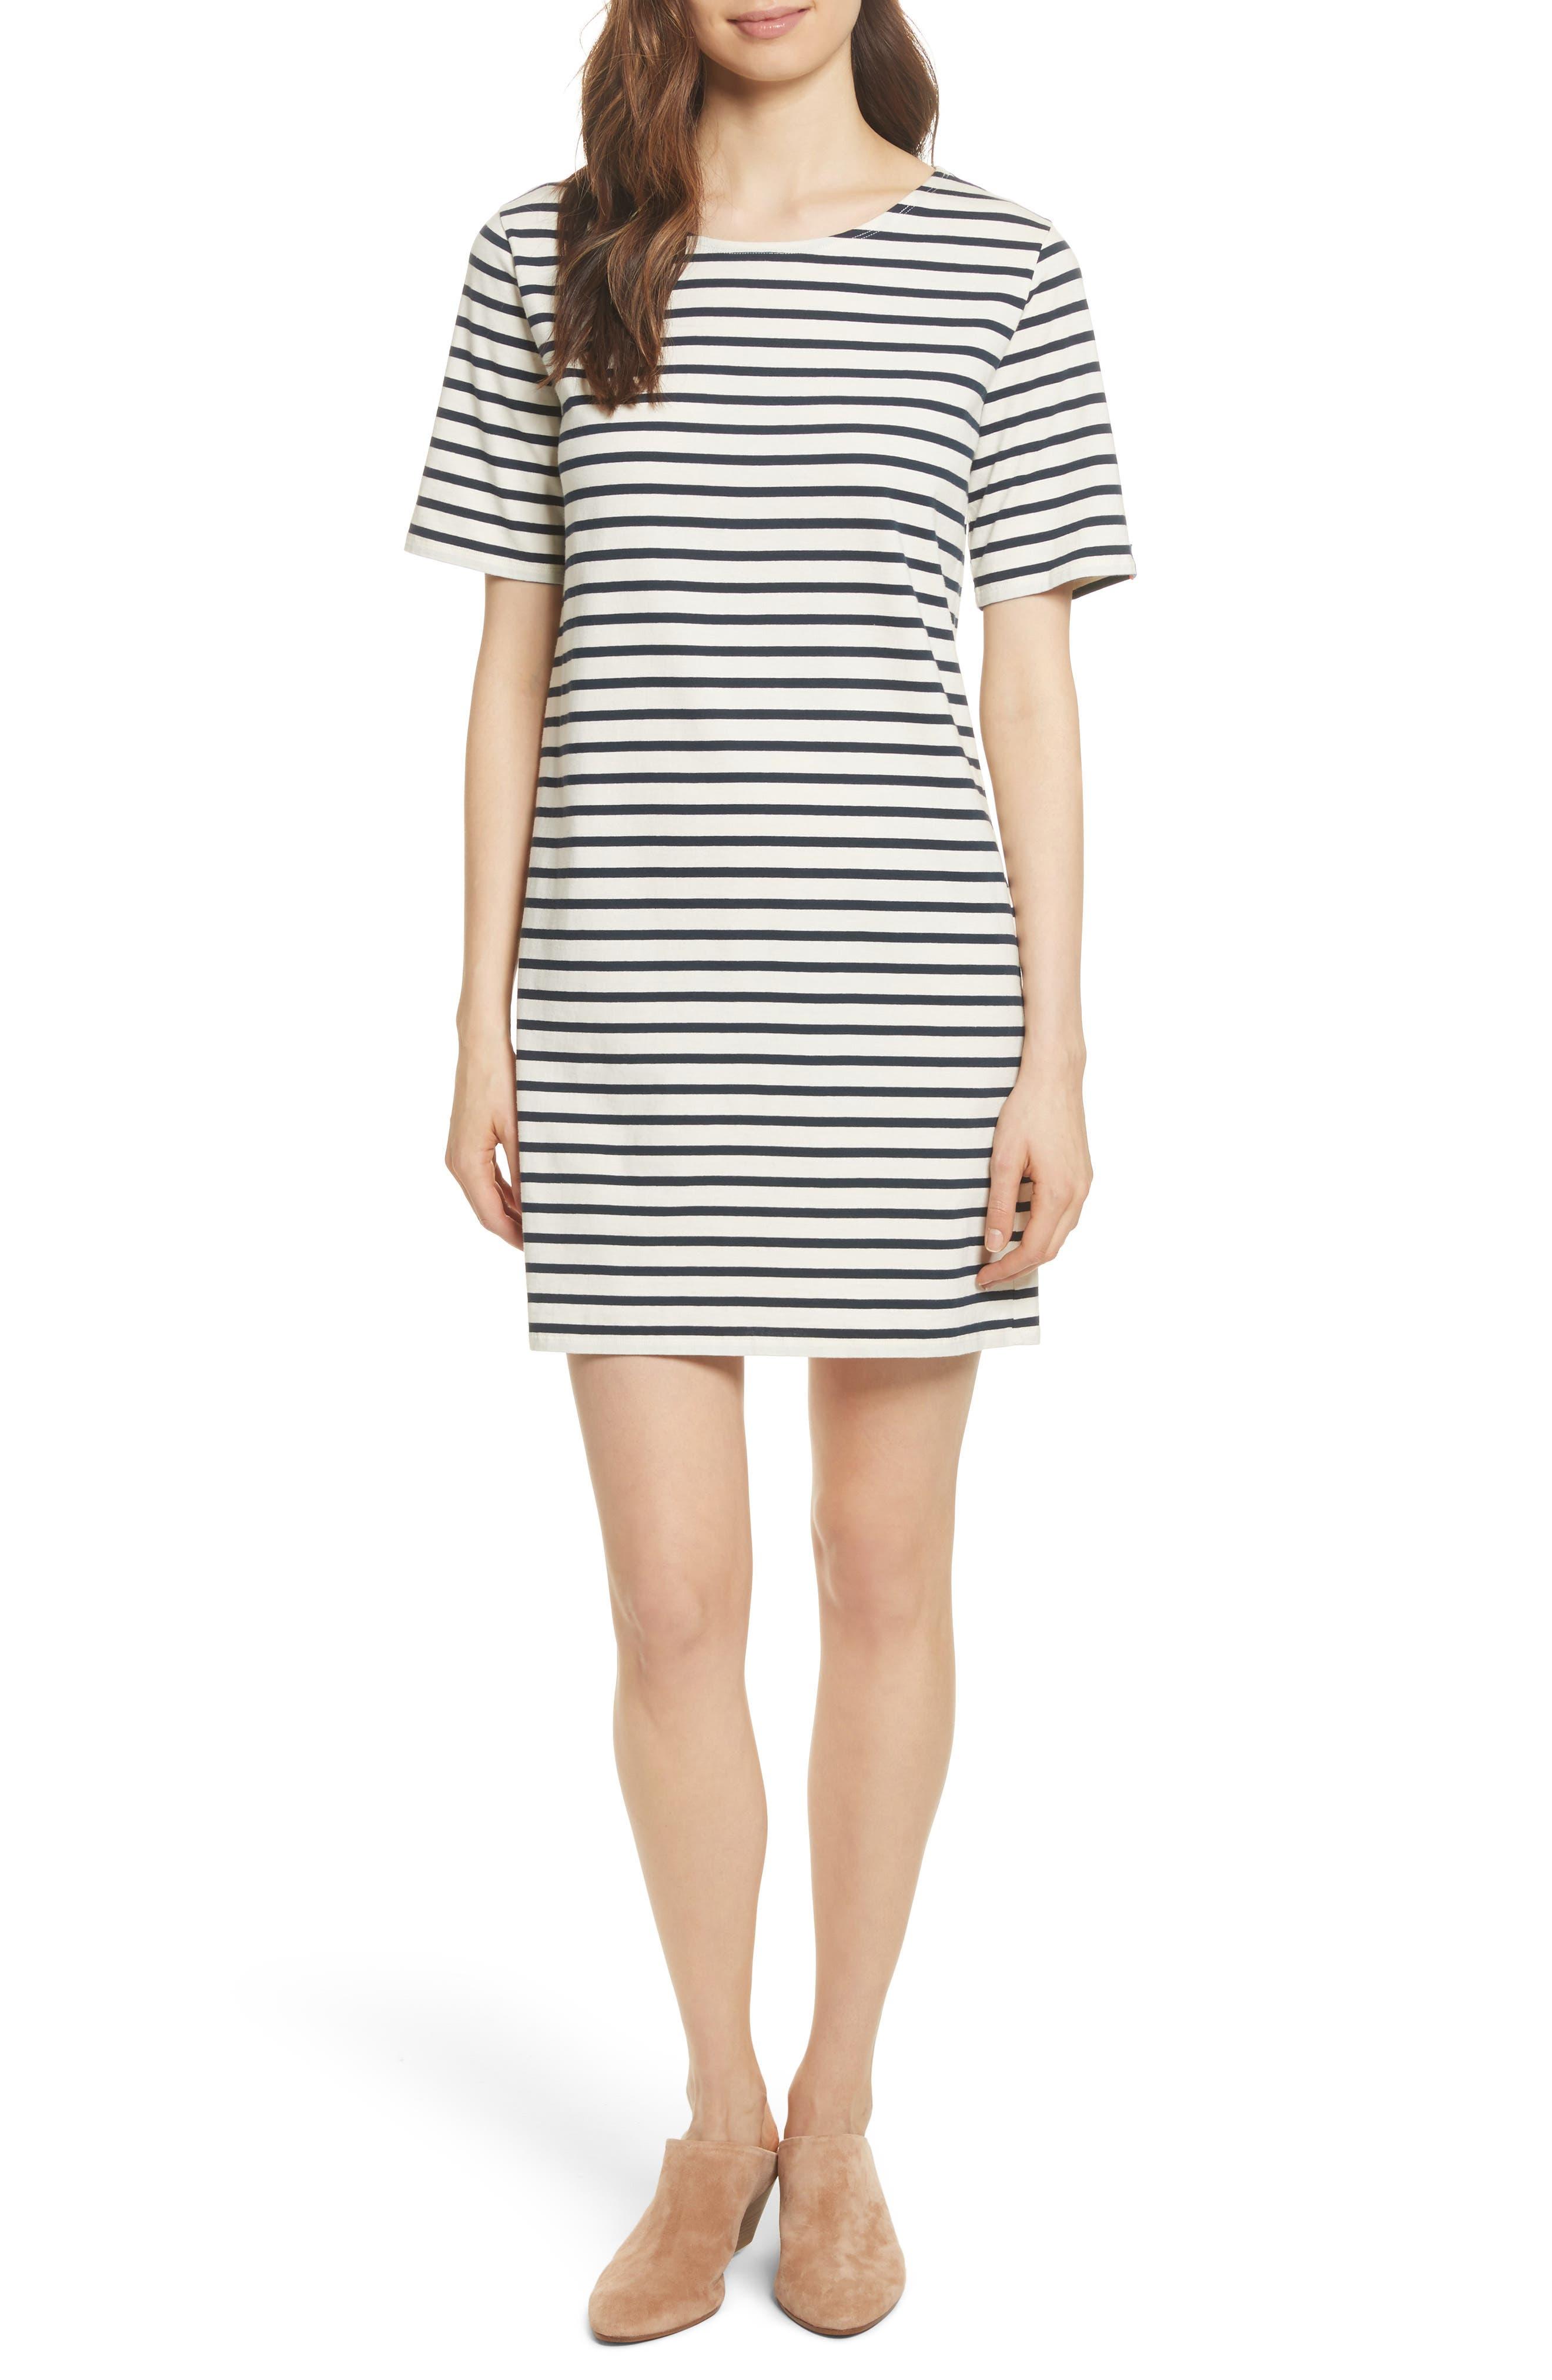 Main Image - Kule The Tee Stripe Dress